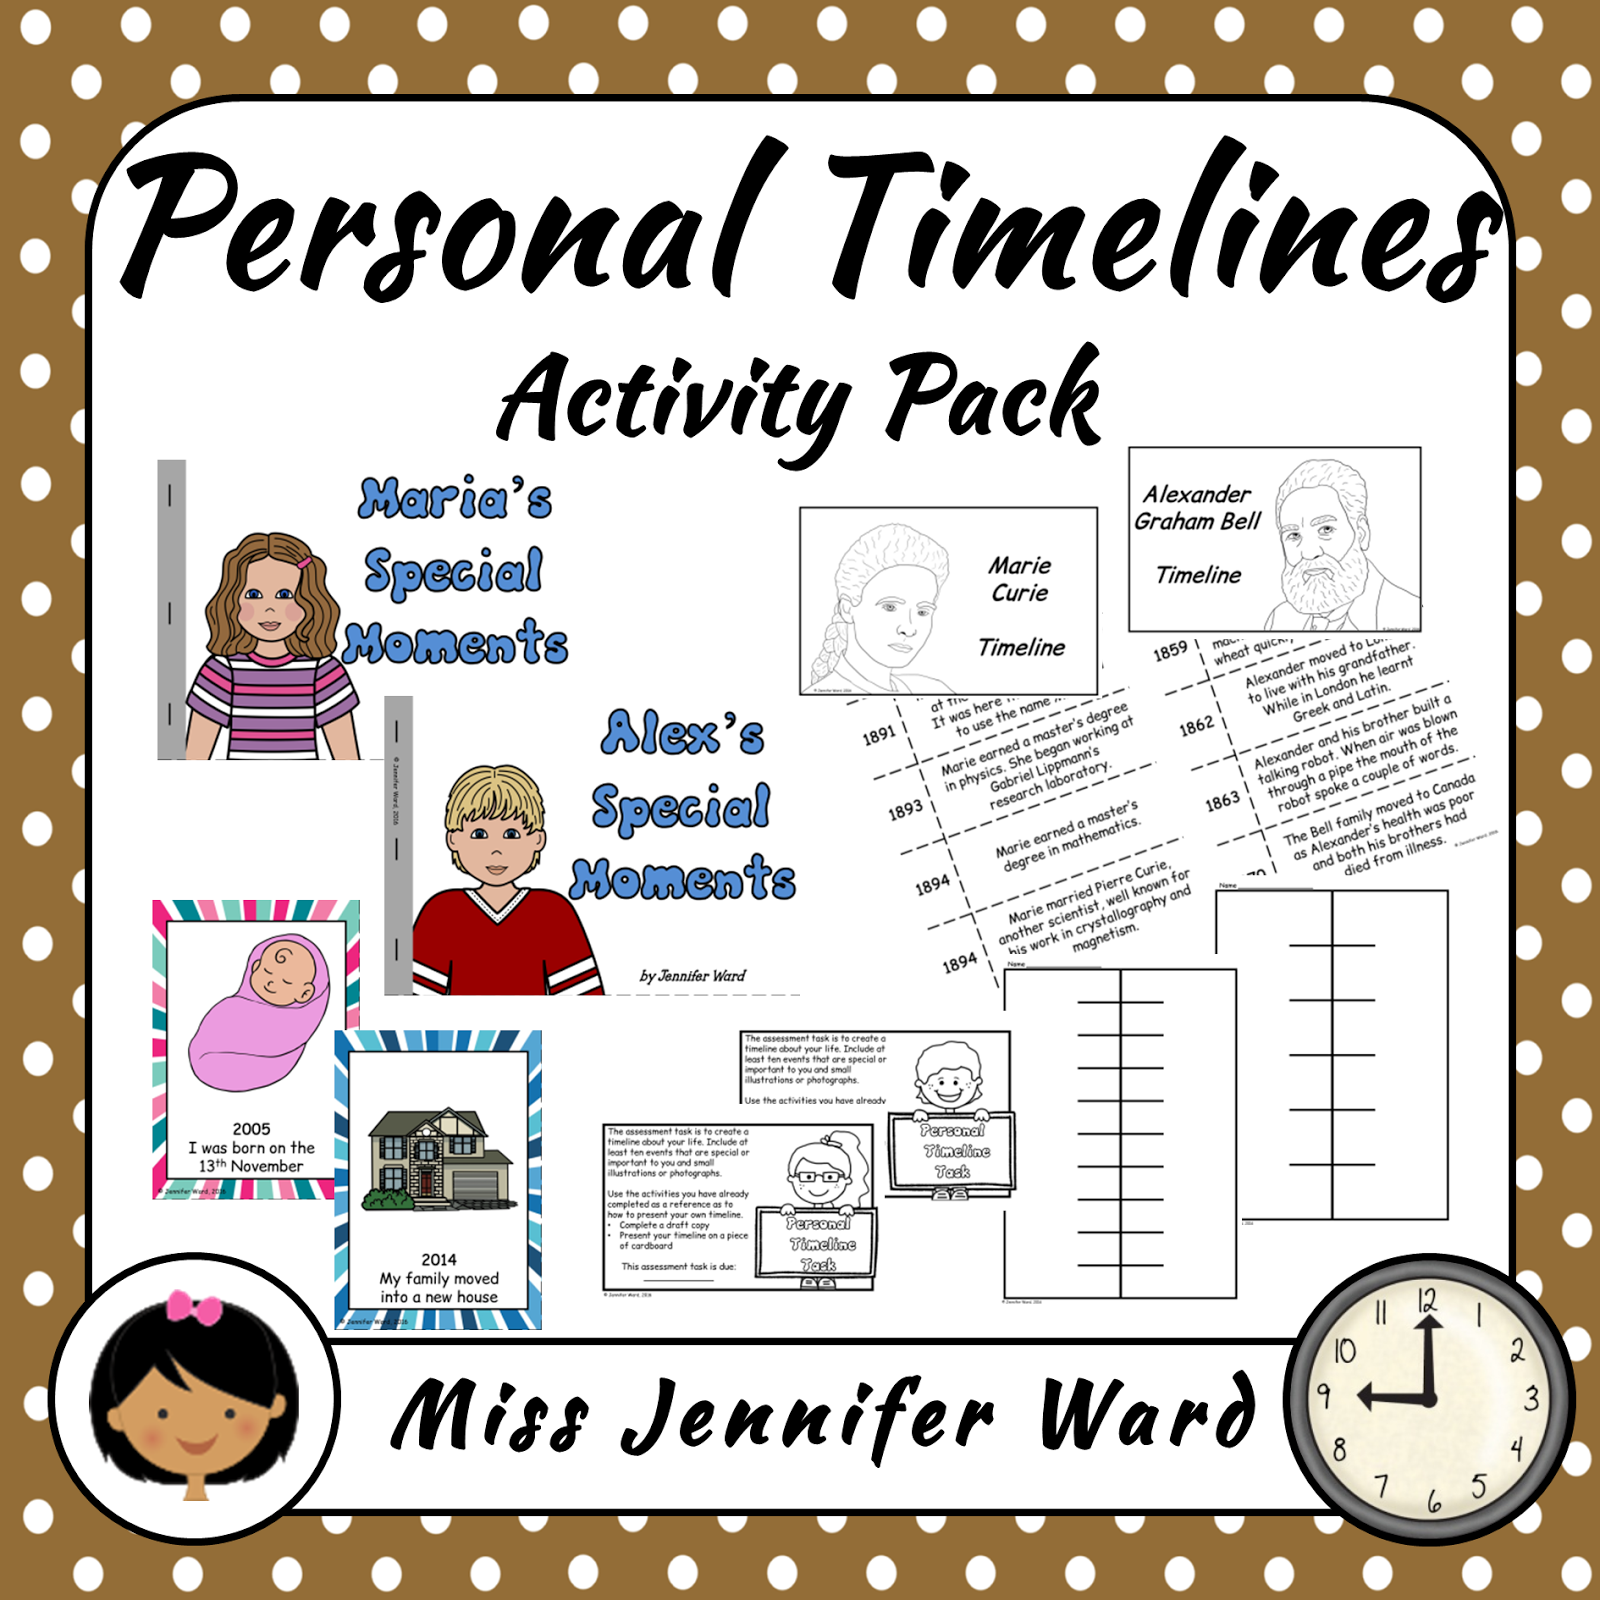 https://www.teacherspayteachers.com/Product/Personal-Timelines-Activity-Pack-2430932